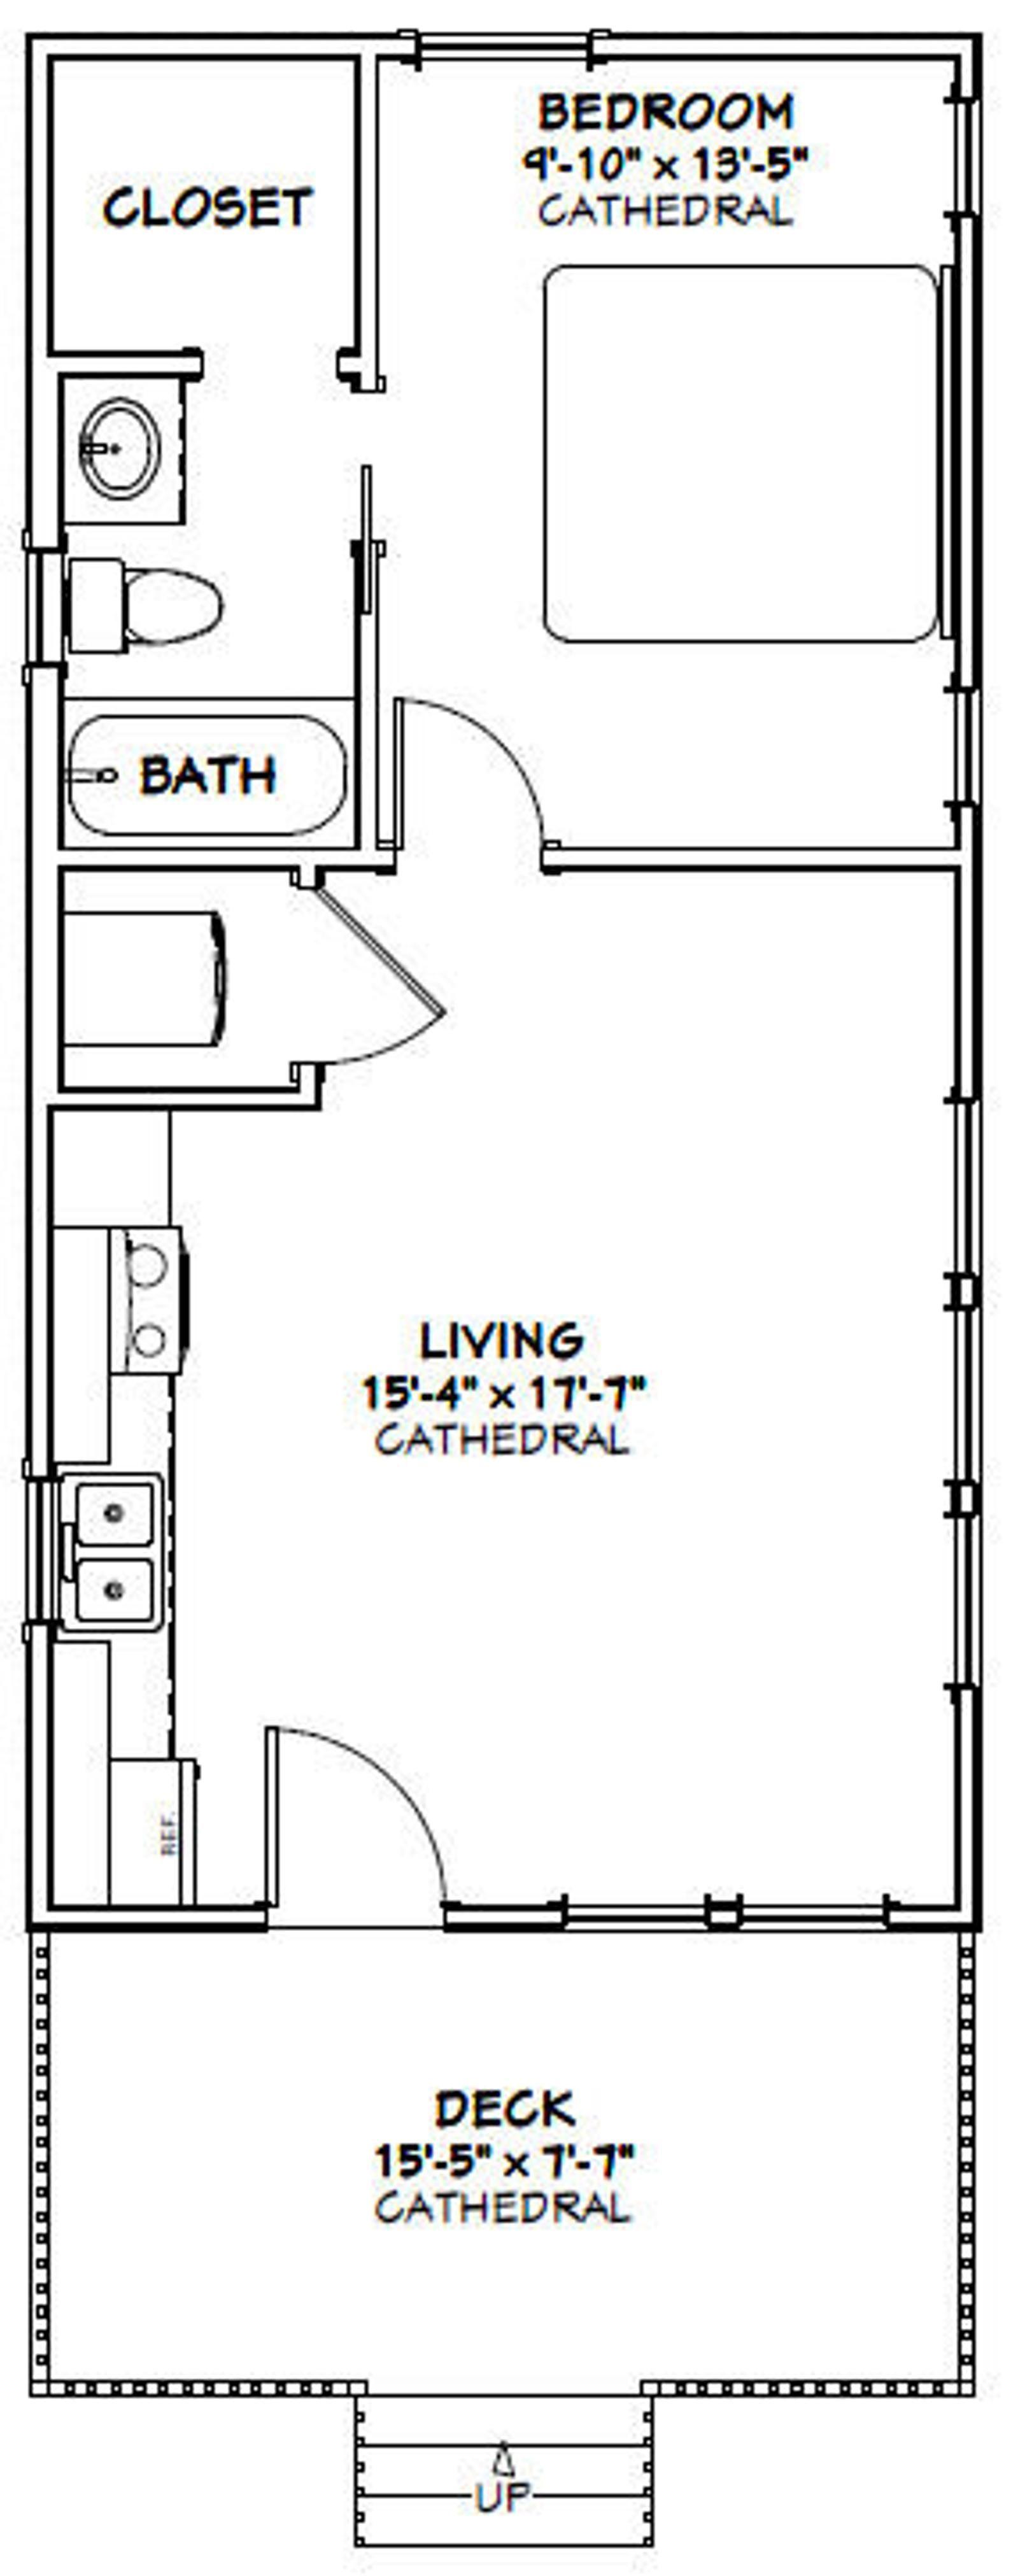 16x32 House 1 Bedroom 1 Bath 511 sq ft PDF Floor Plan Instant Download Model 3D